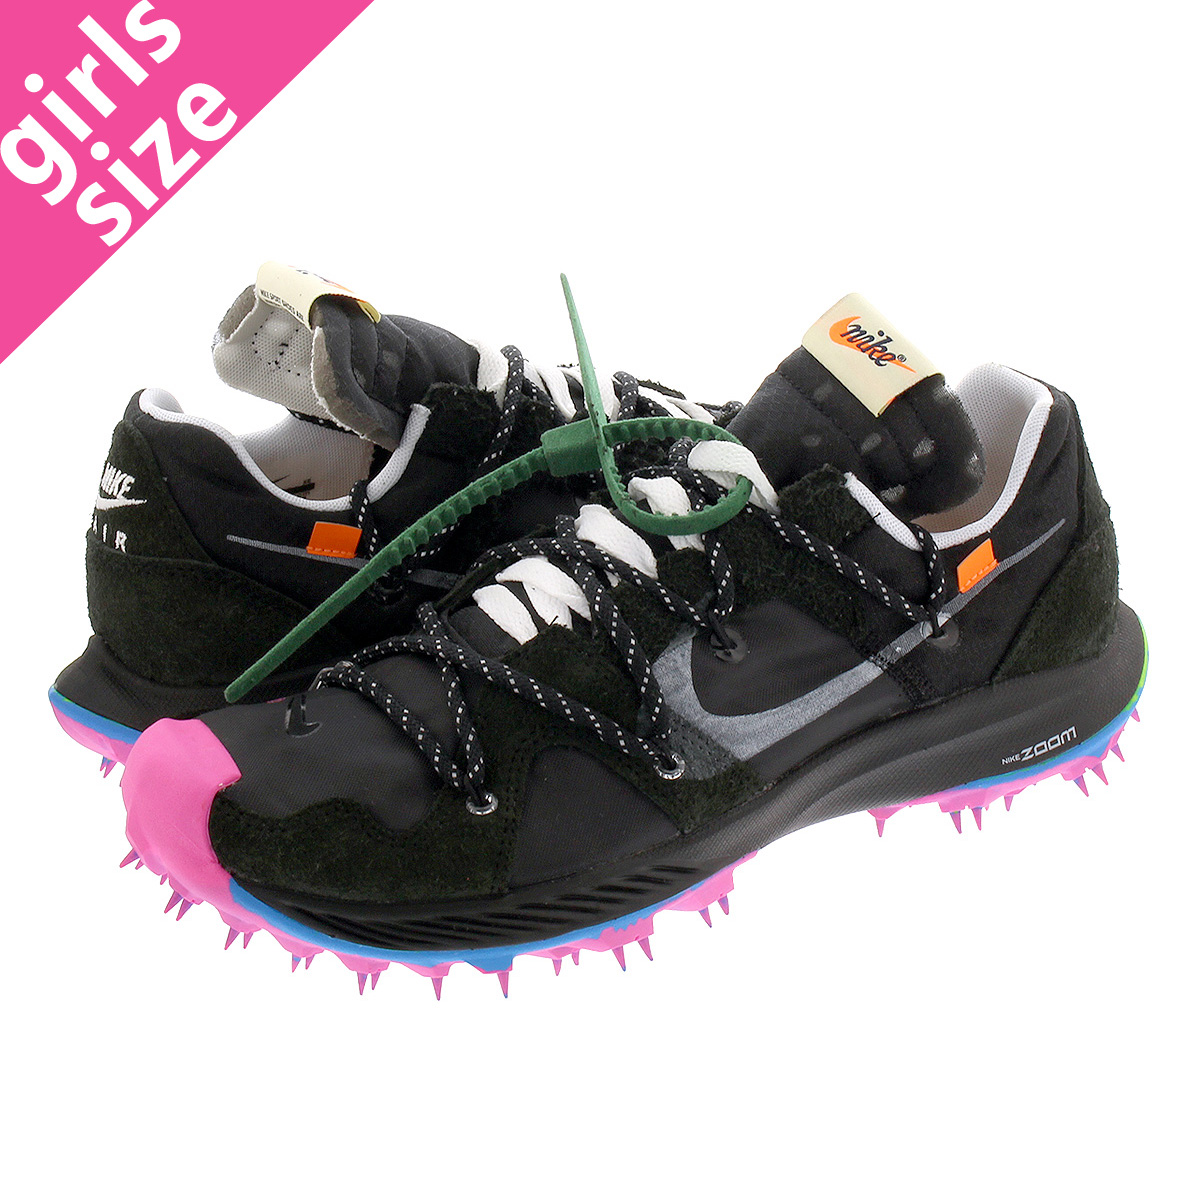 NIKE WMNS ZOOM TERRA KIGER 5 Nike women zoom terra chi garfish 5 BLACKMETALLIC SILVERWHITEPINK BLAST cd8179 001